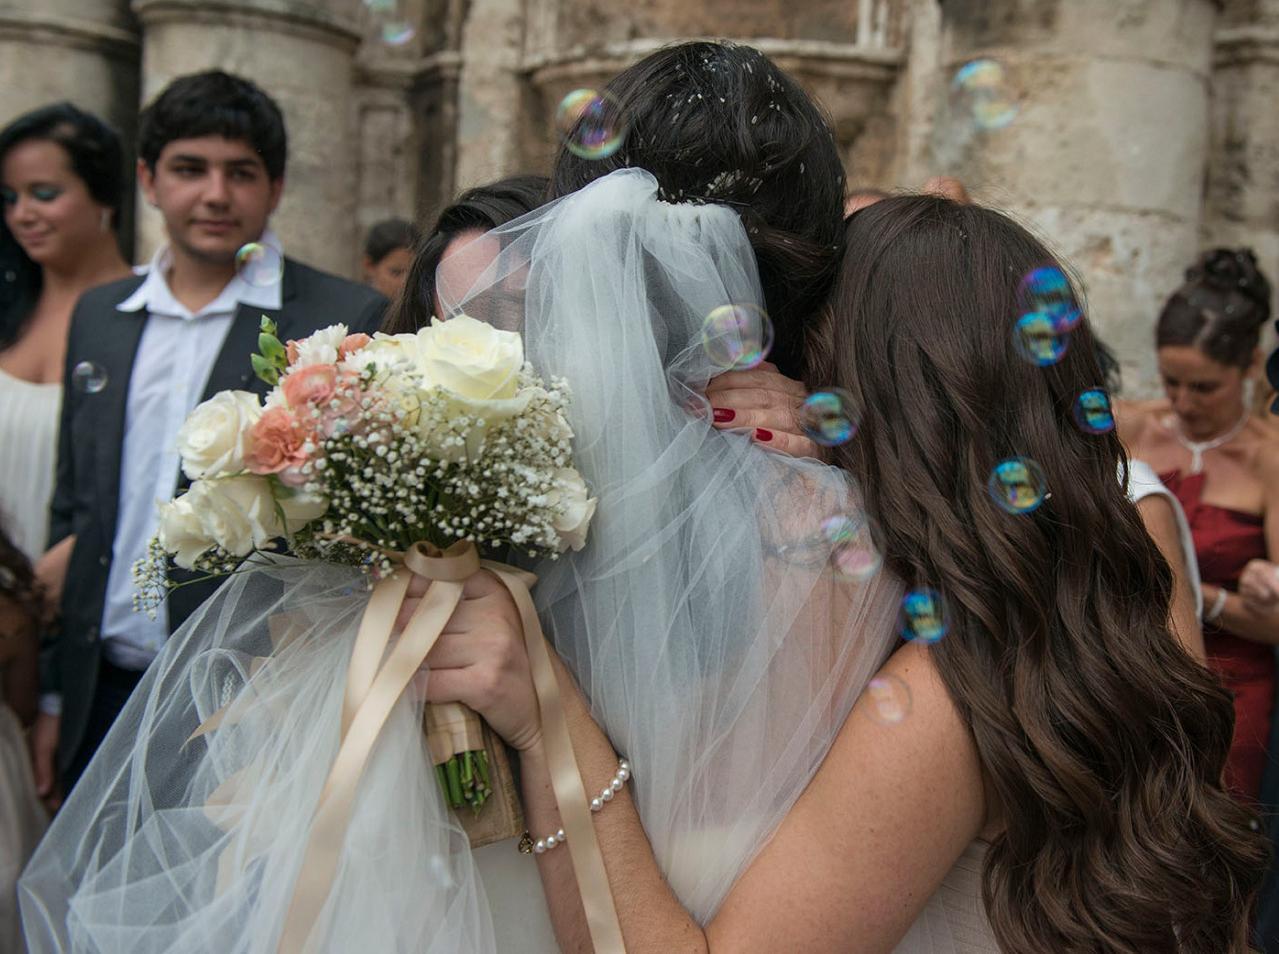 bodas-sin-clasificar-sin-tema-cuba-15031.jpg